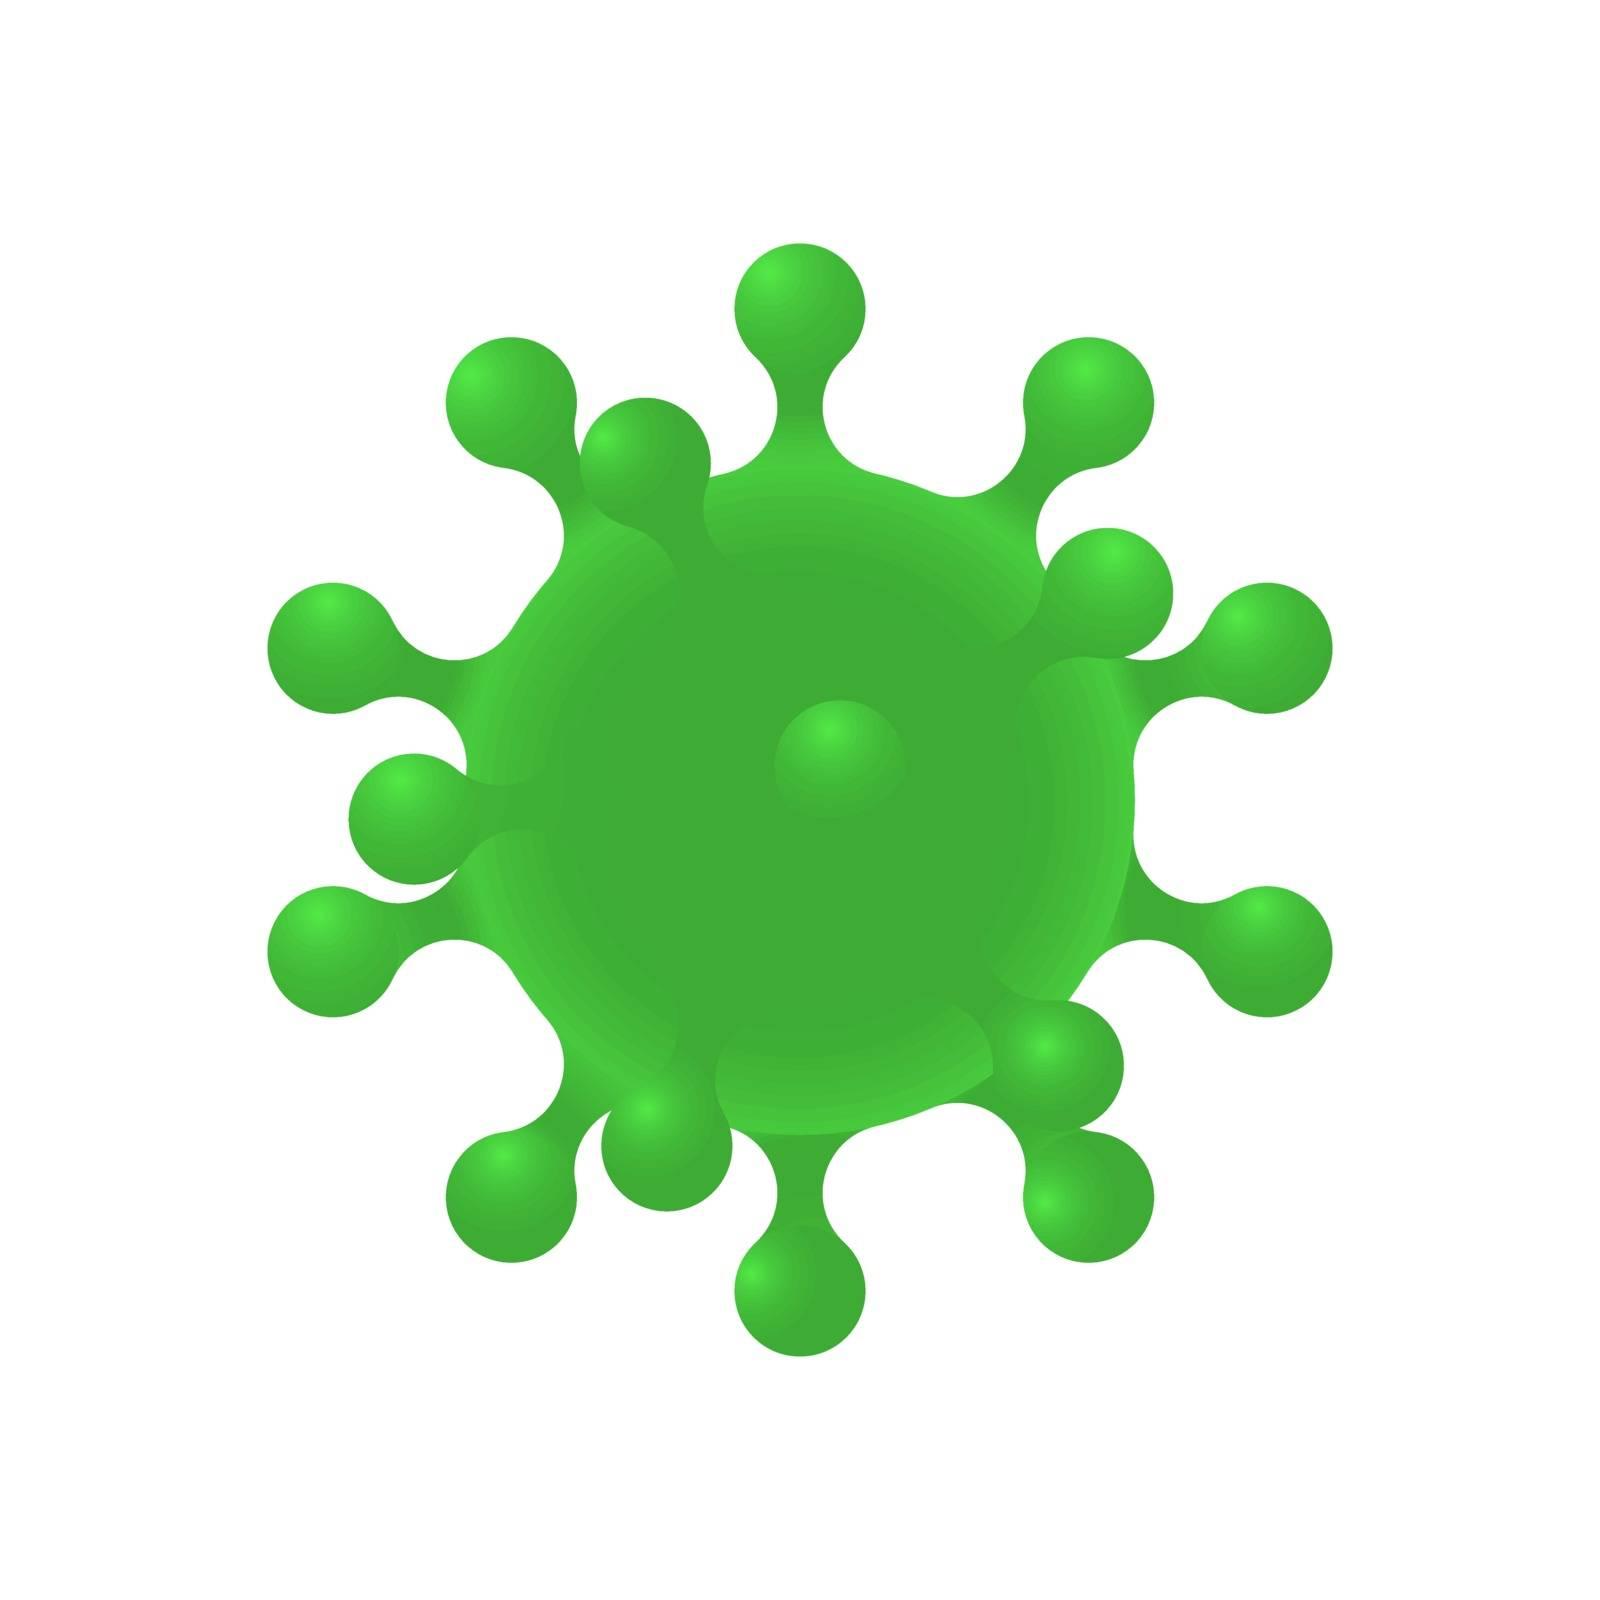 Coronavirus. Realistic 3d green virus cell. Corona virus symbol. Virus Covid 19-NCP.